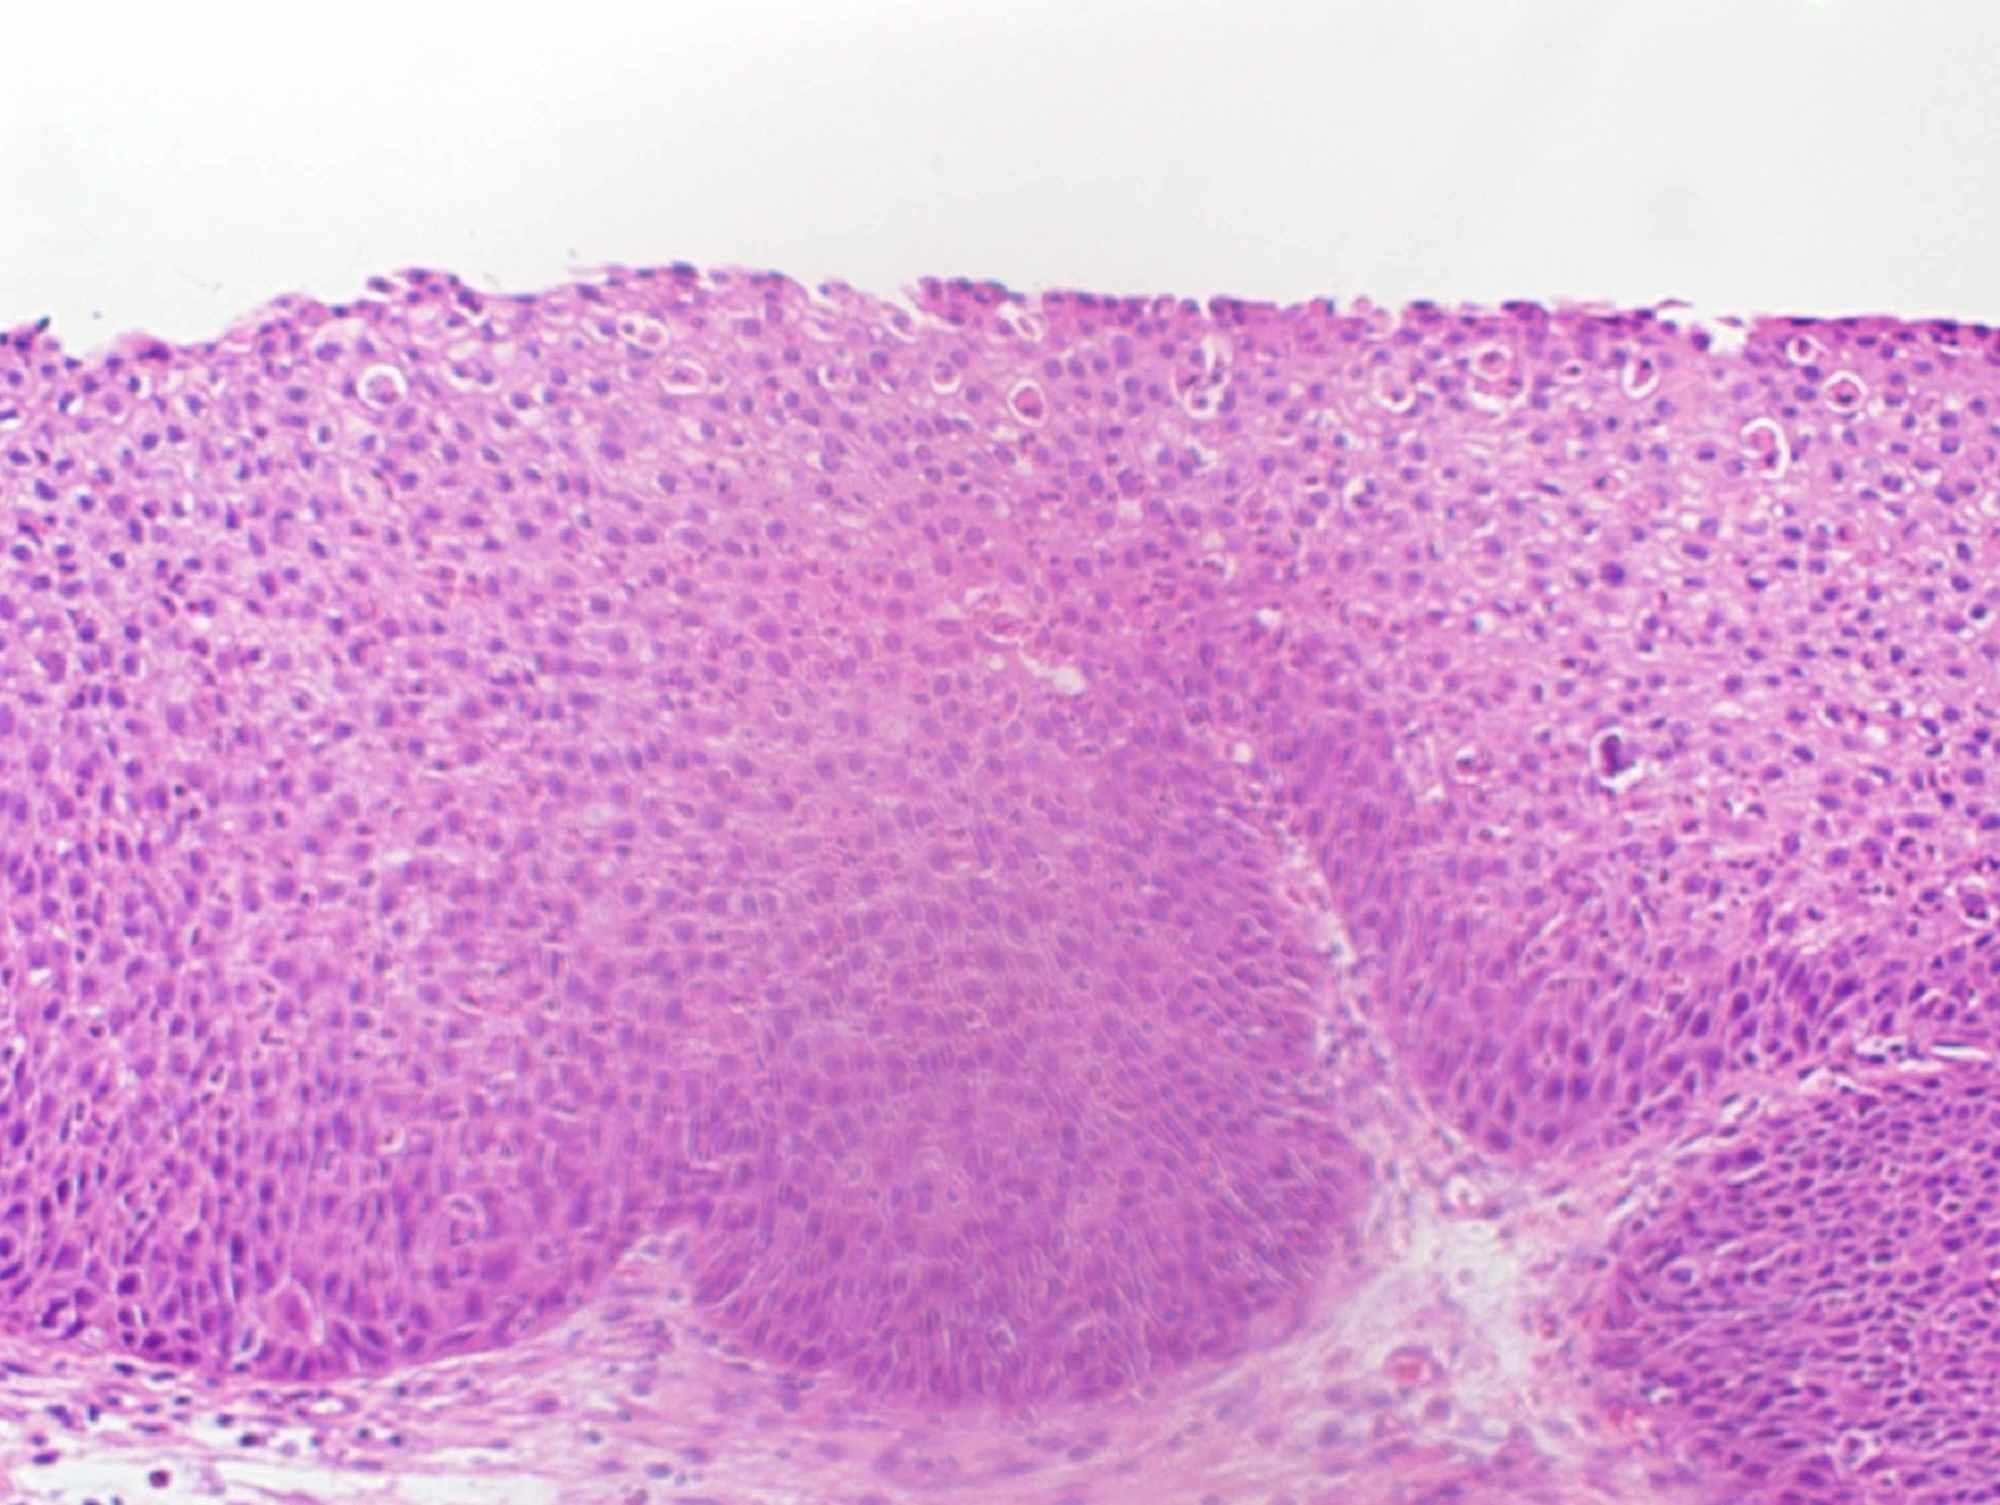 virus papiloma humano contagio de mujer a hombre puppy papilloma mouth